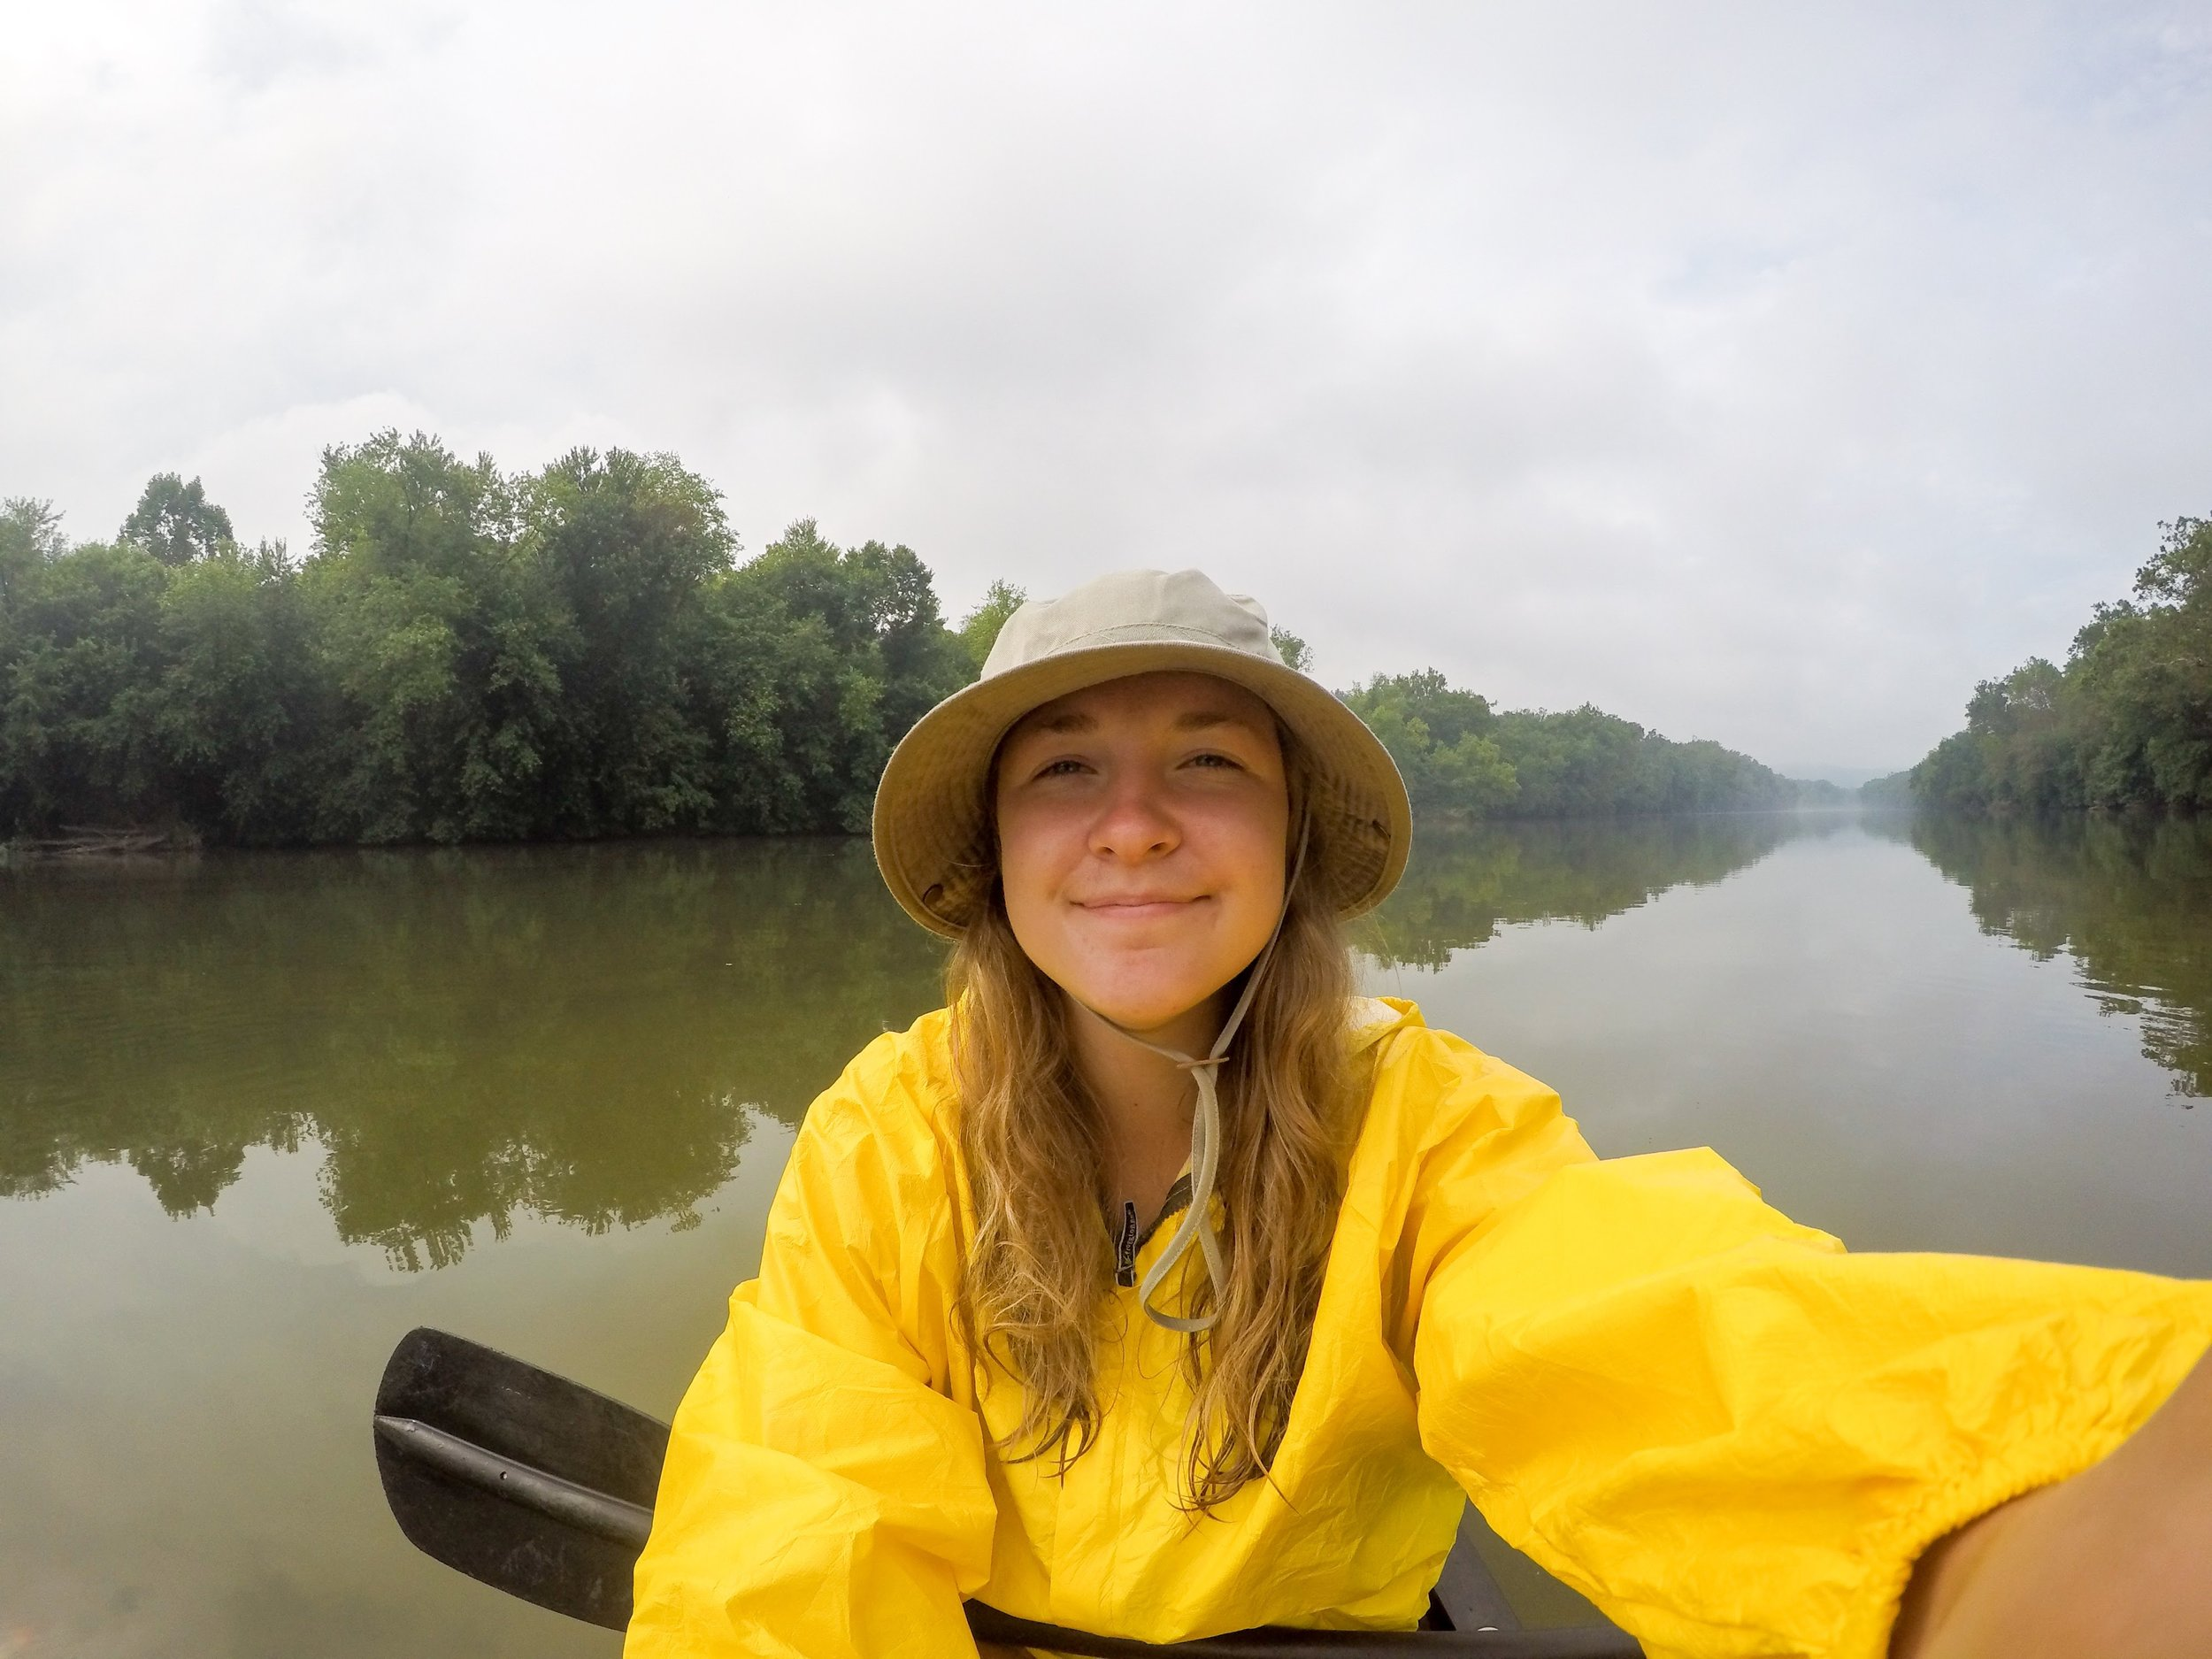 Appalachian Trail, Shenandoah River, VA